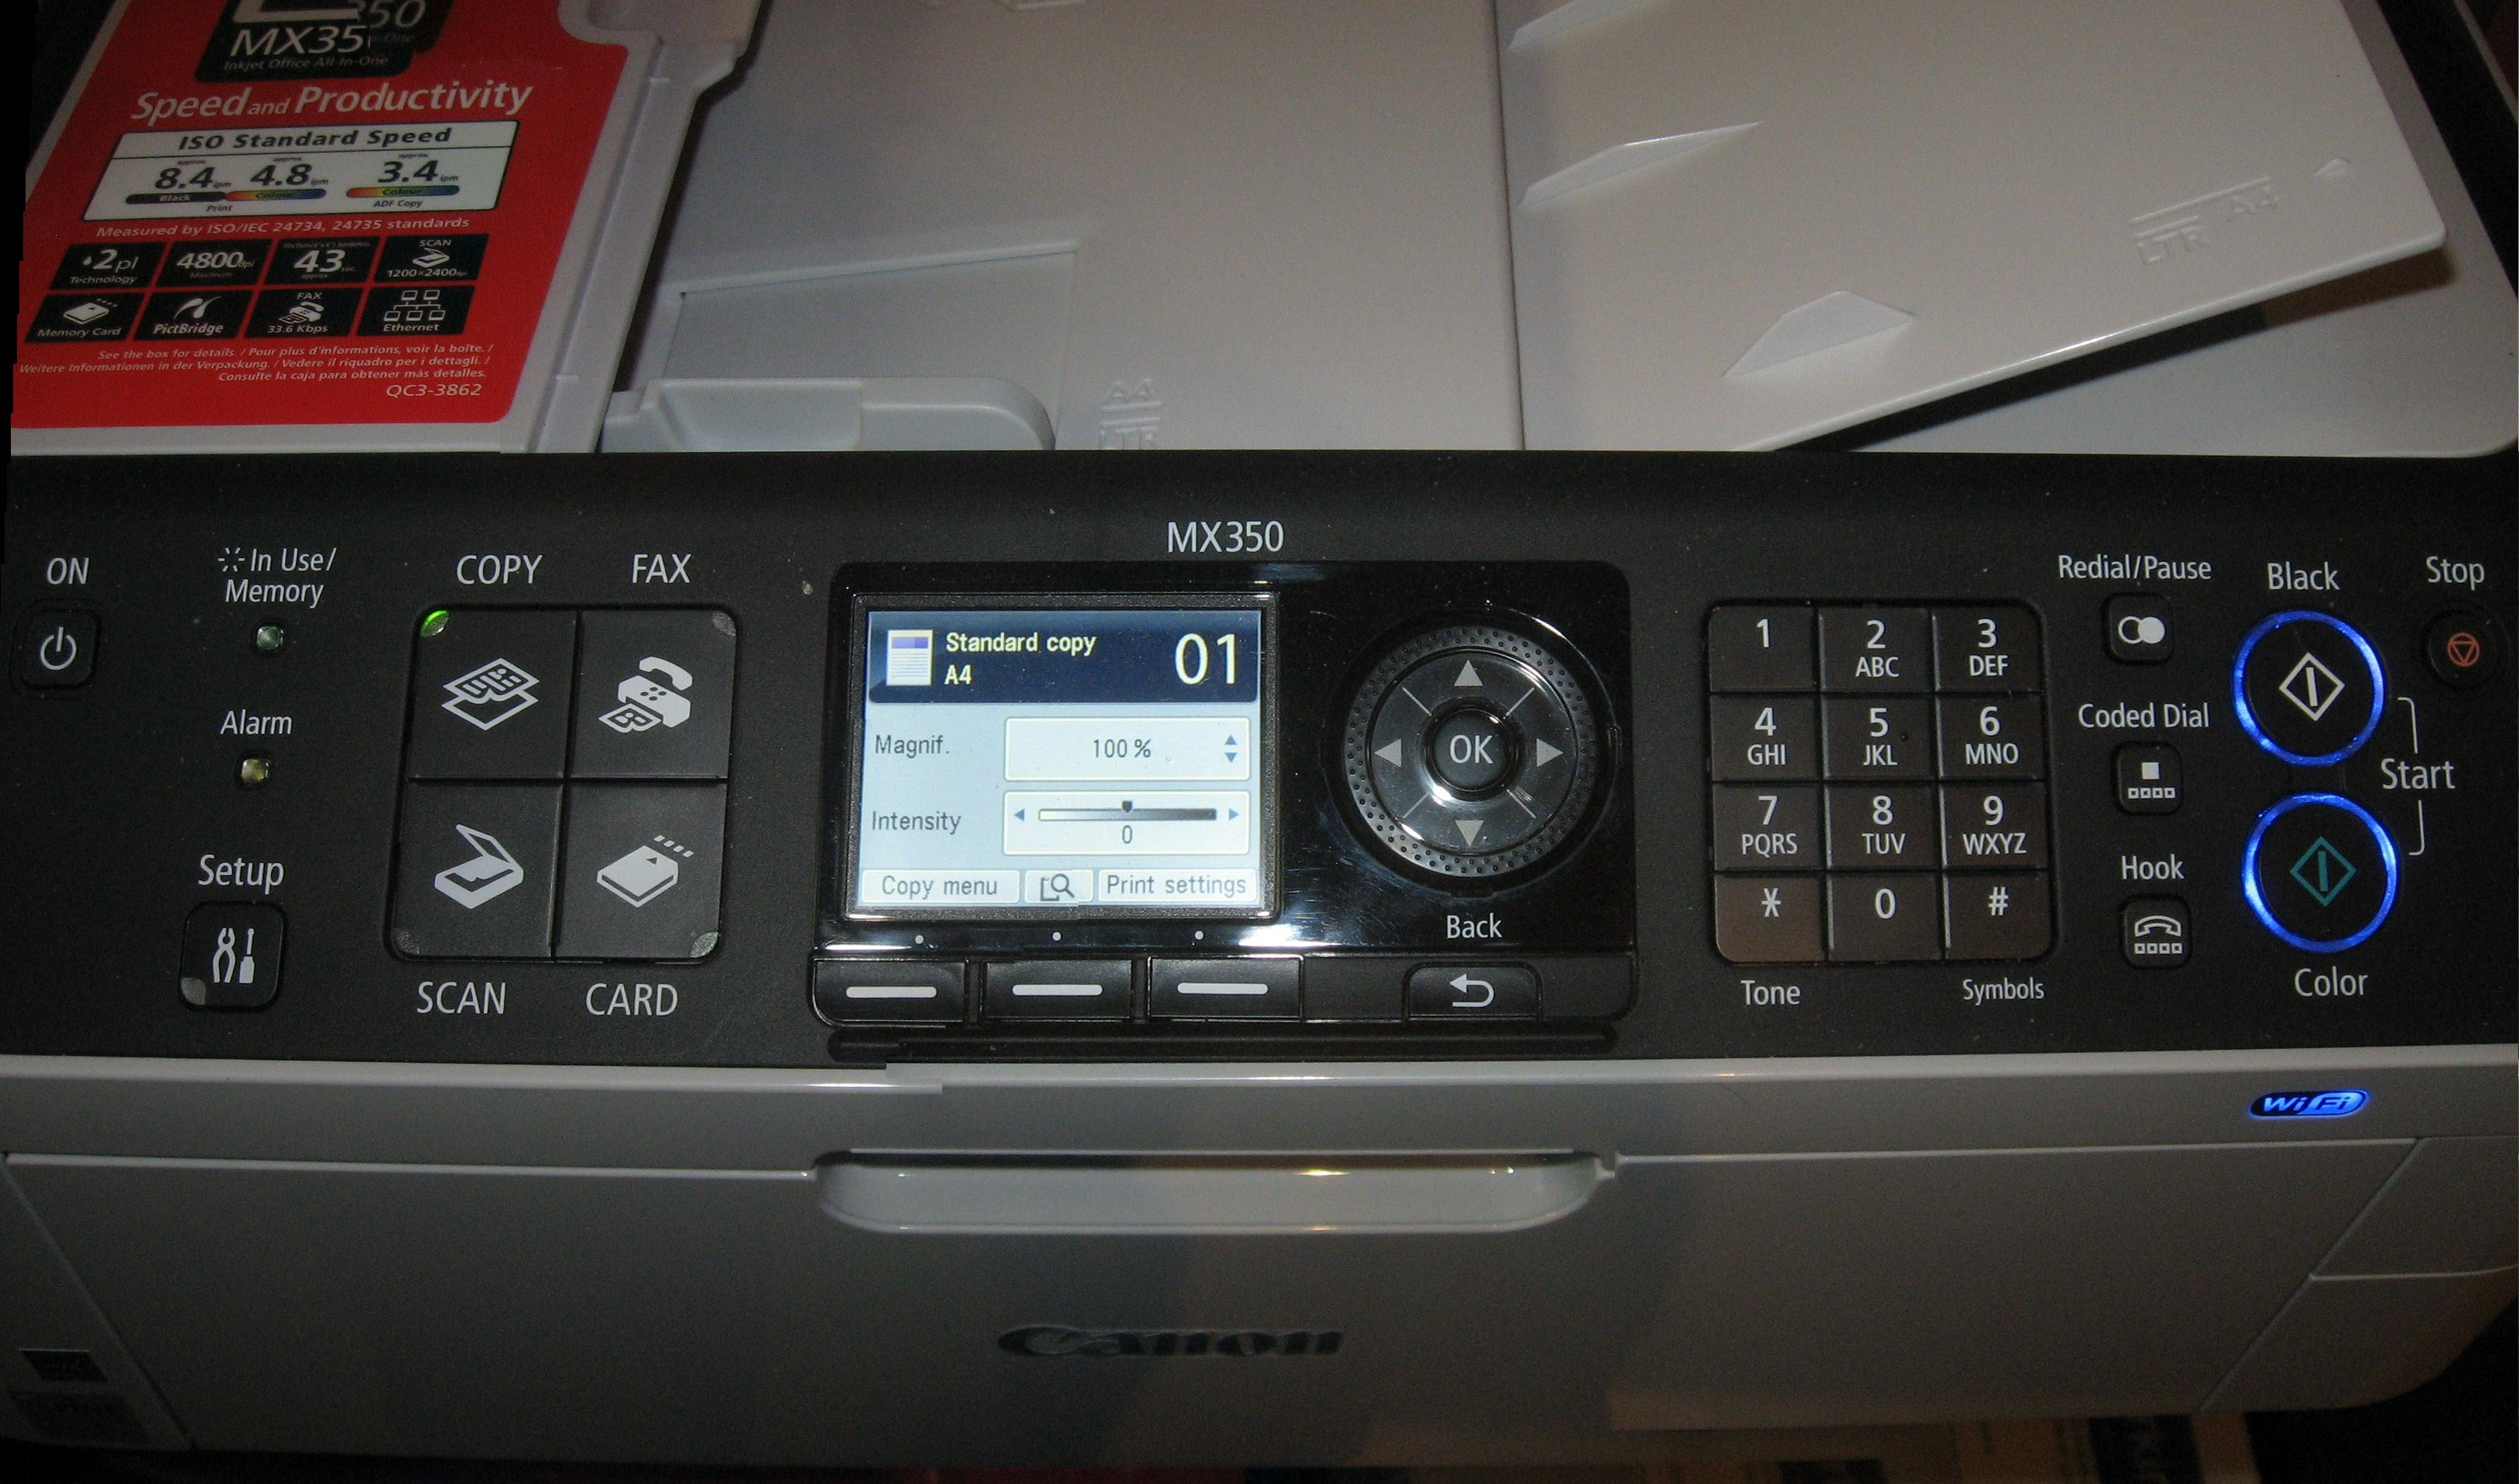 Canon PIXMA MX-350 control panel